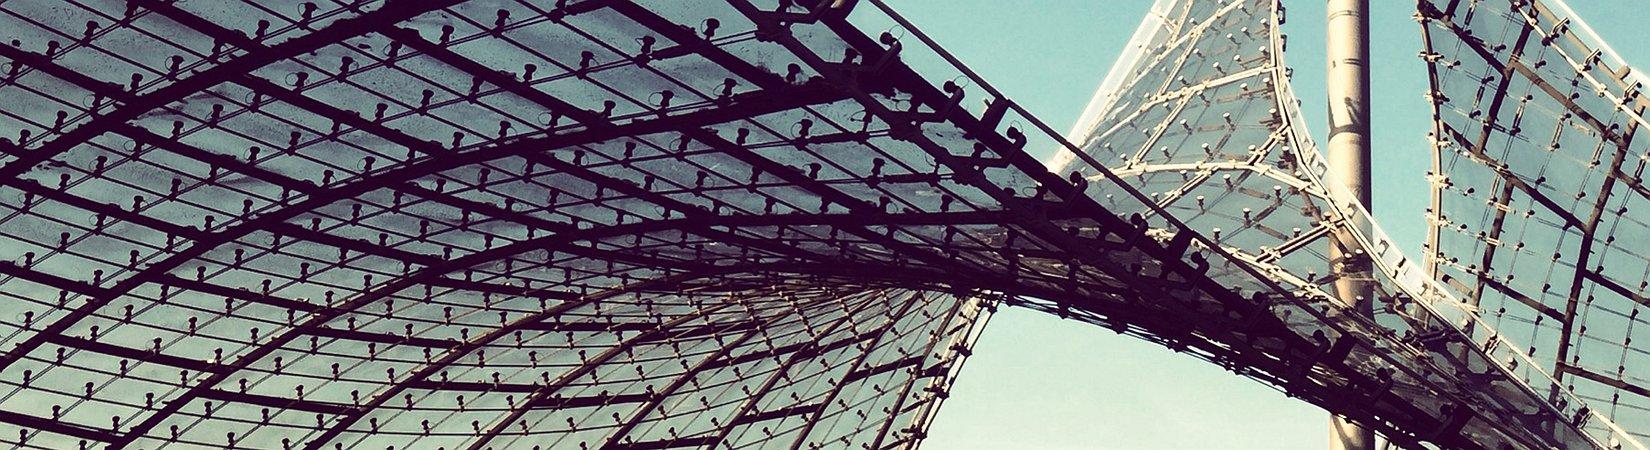 Miracoli dell'architettura moderna